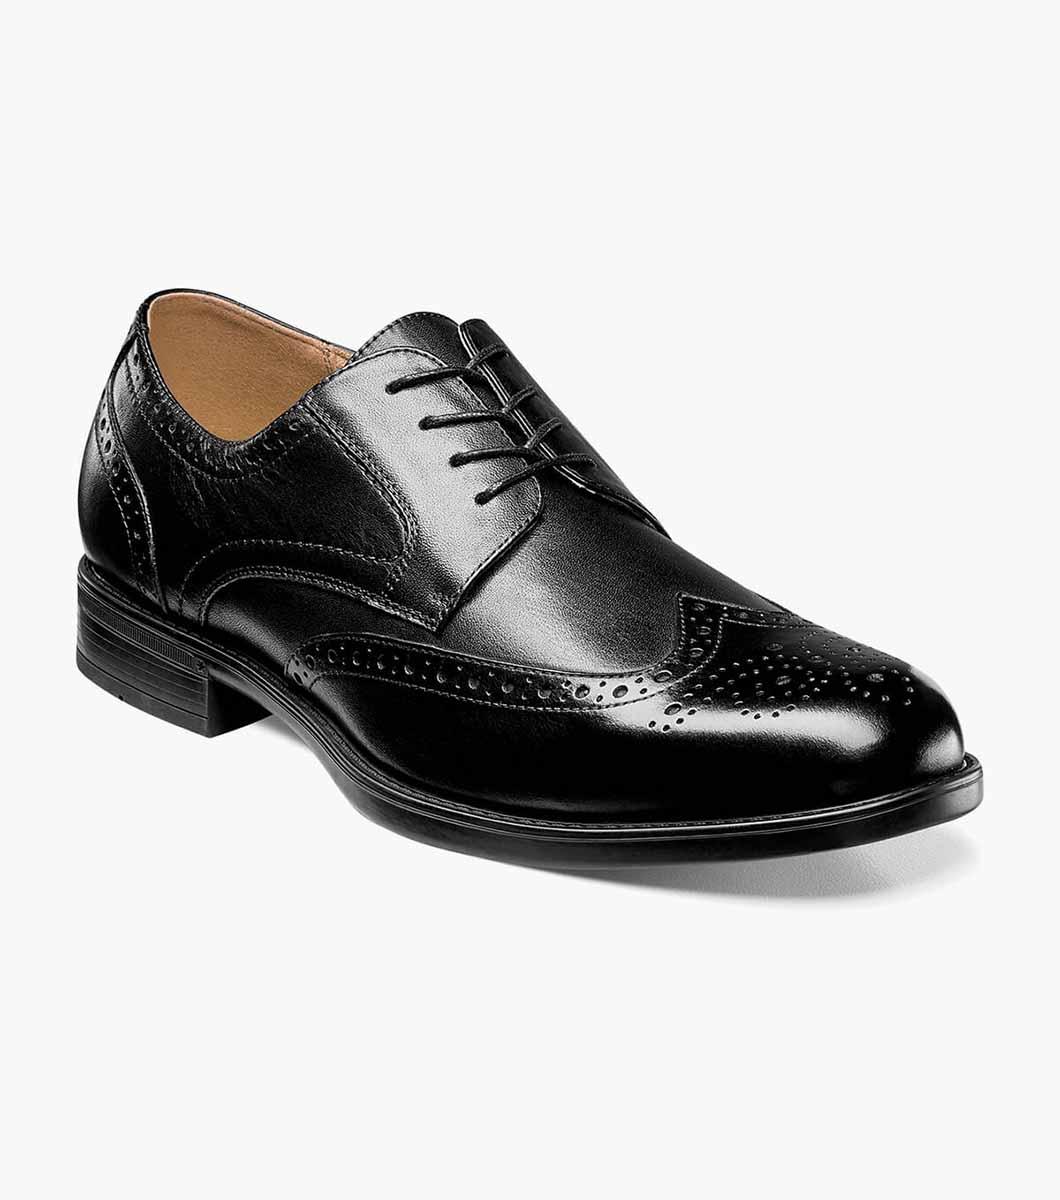 Florsheim Men/'s Midtown Wingtip Oxford Black US Sizes//Widths